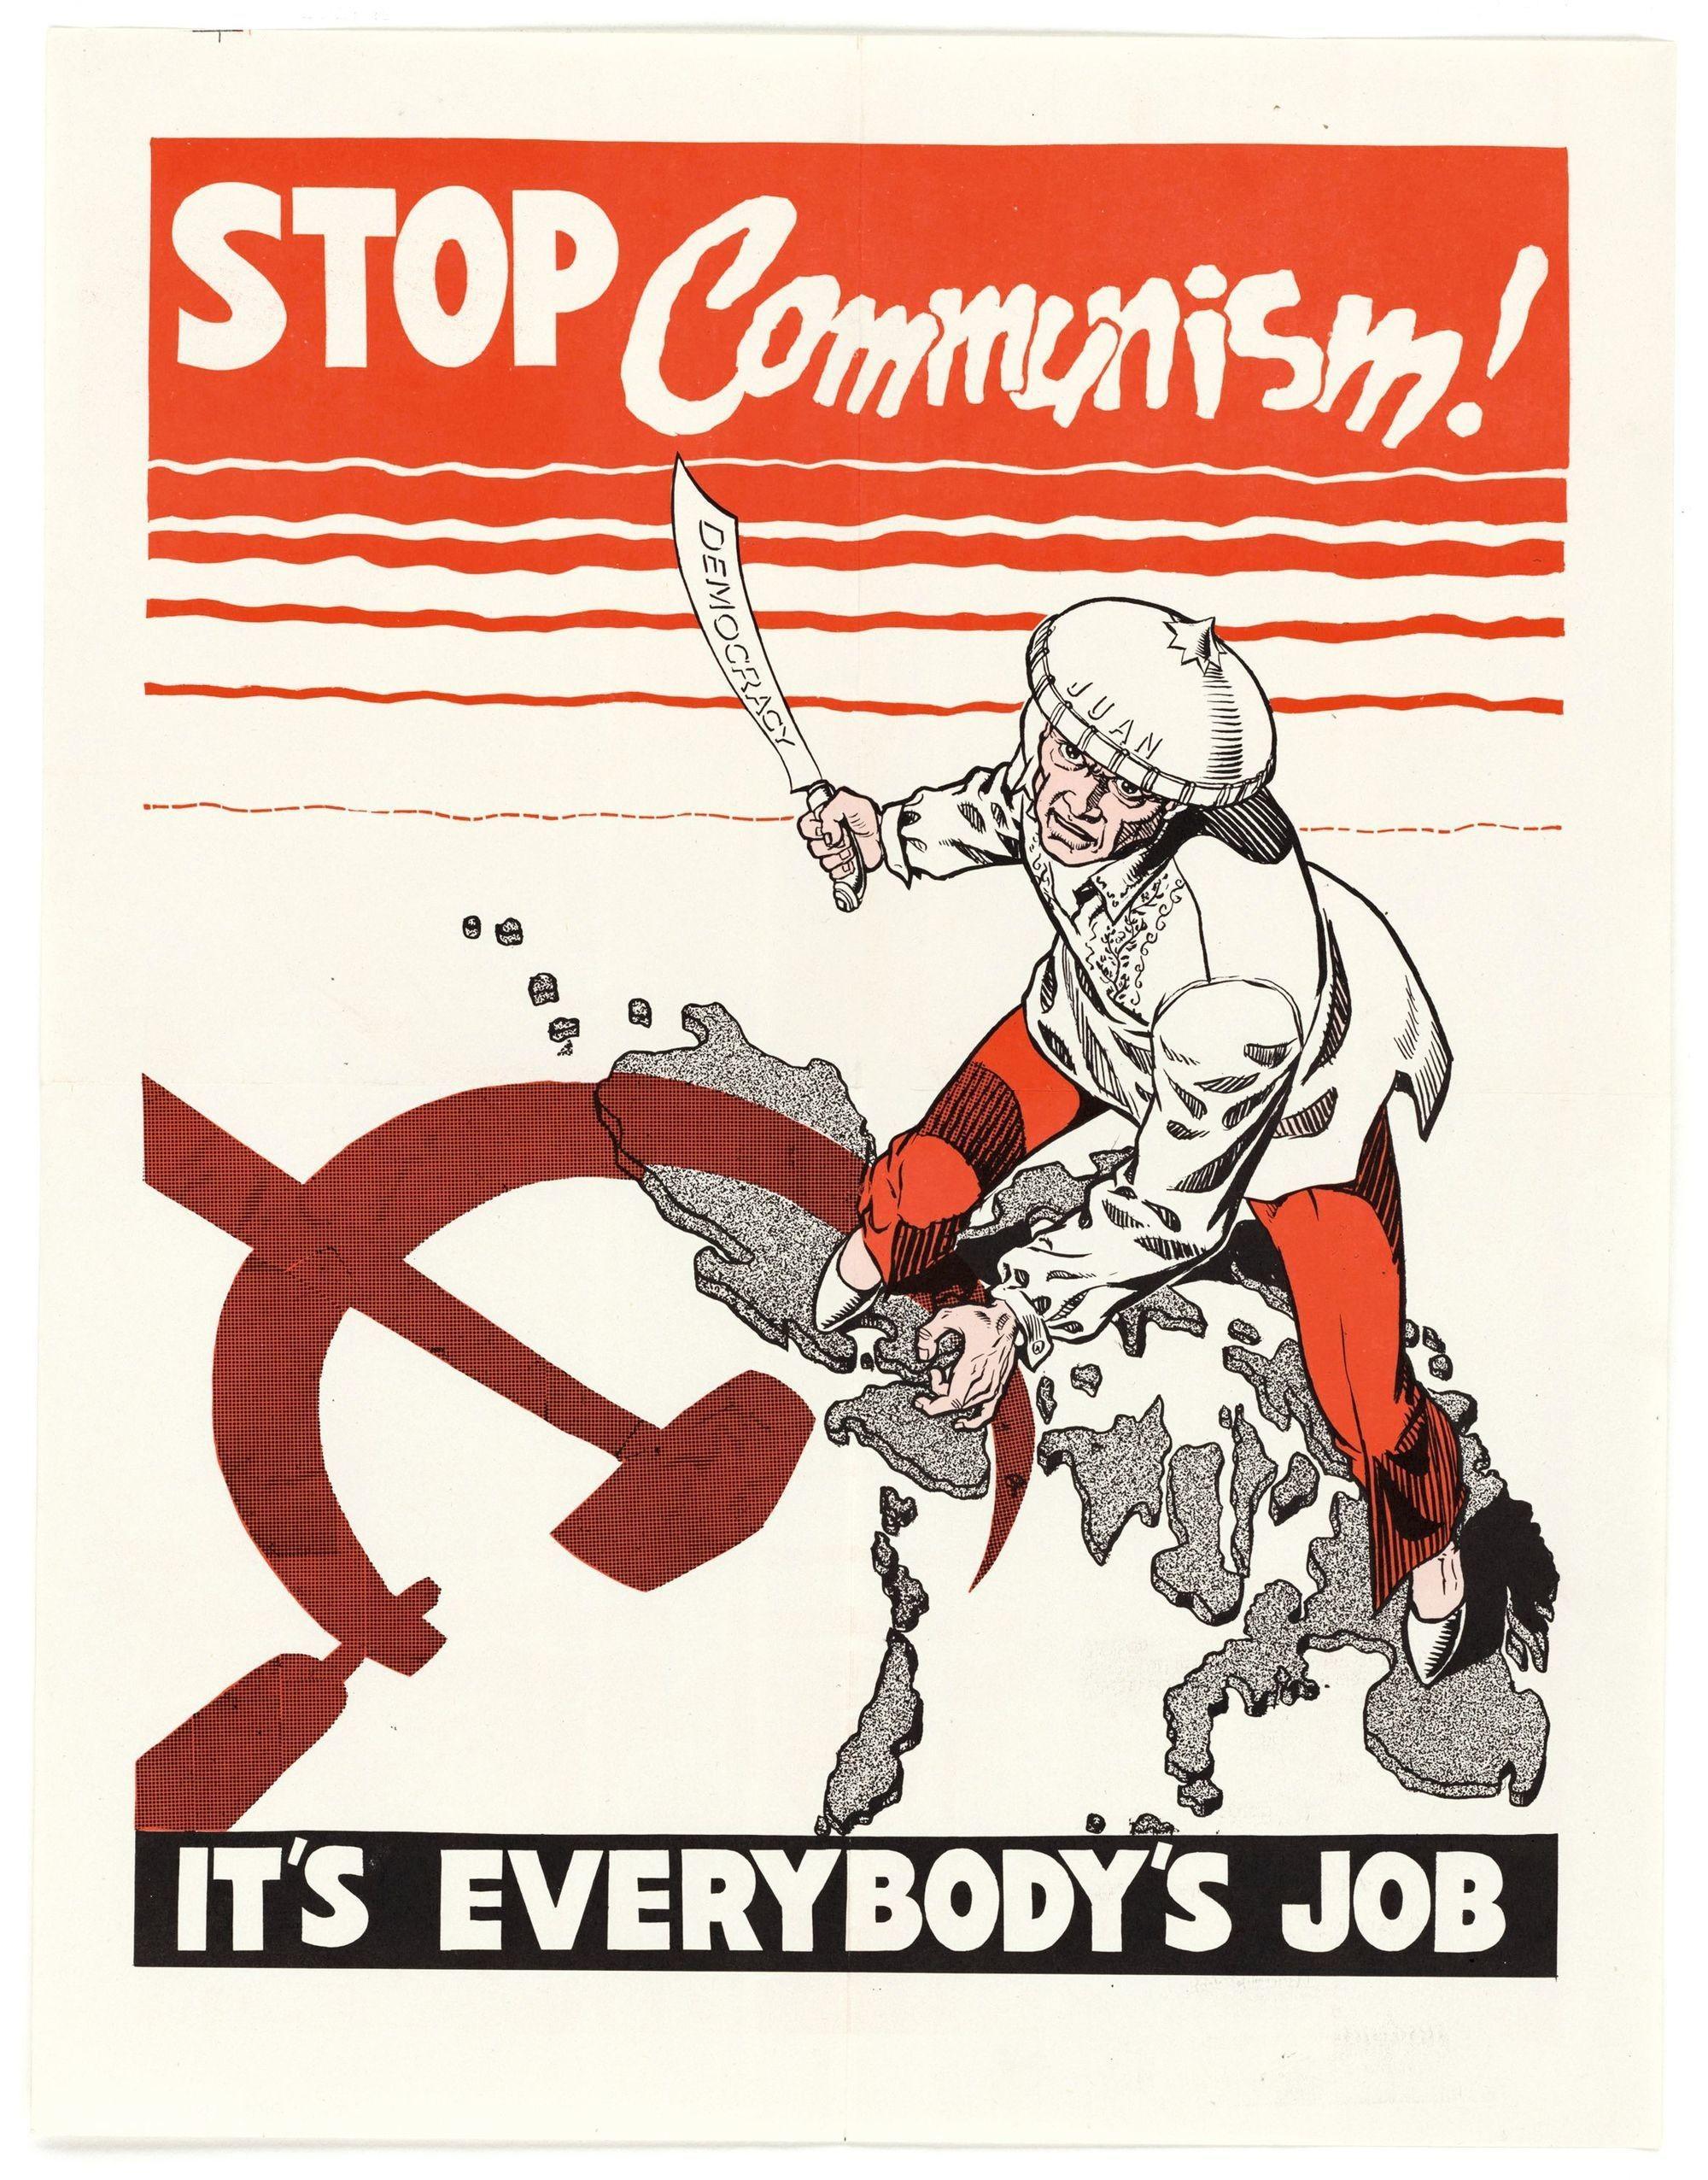 Anonyme, affiche américaine anti-communiste, 1951